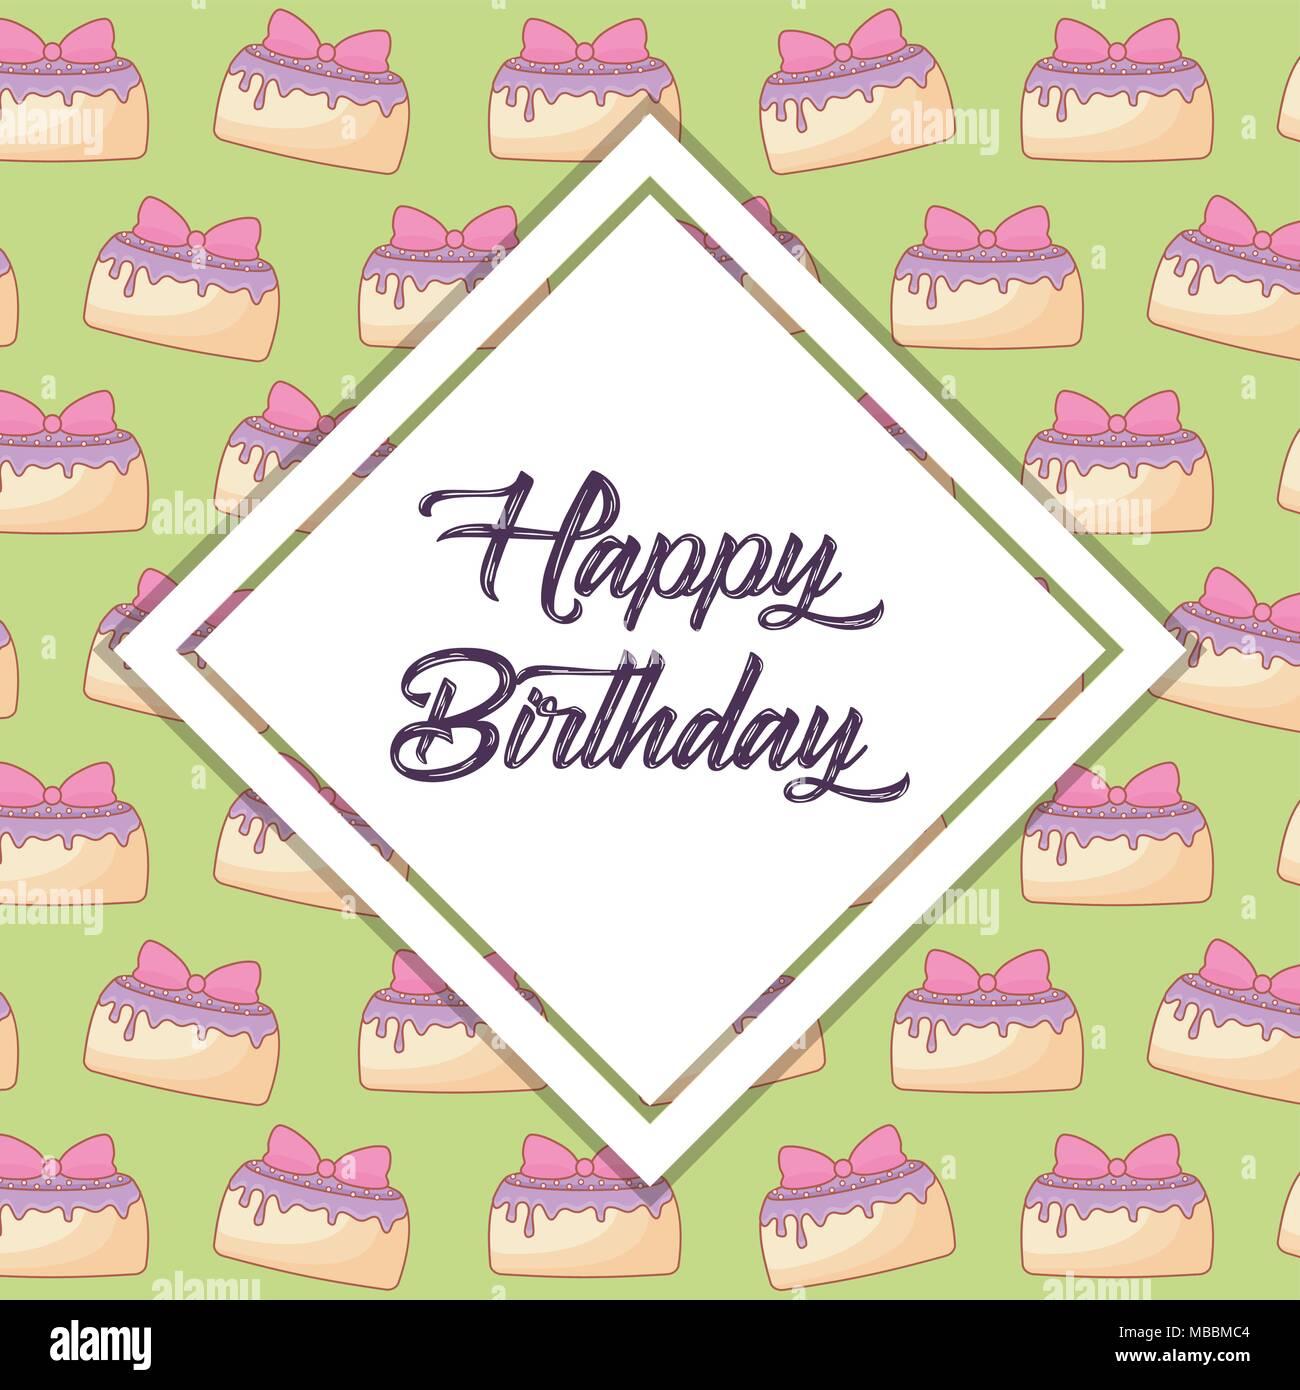 Happy birthday design with decorative rhombus frame over birthday ...